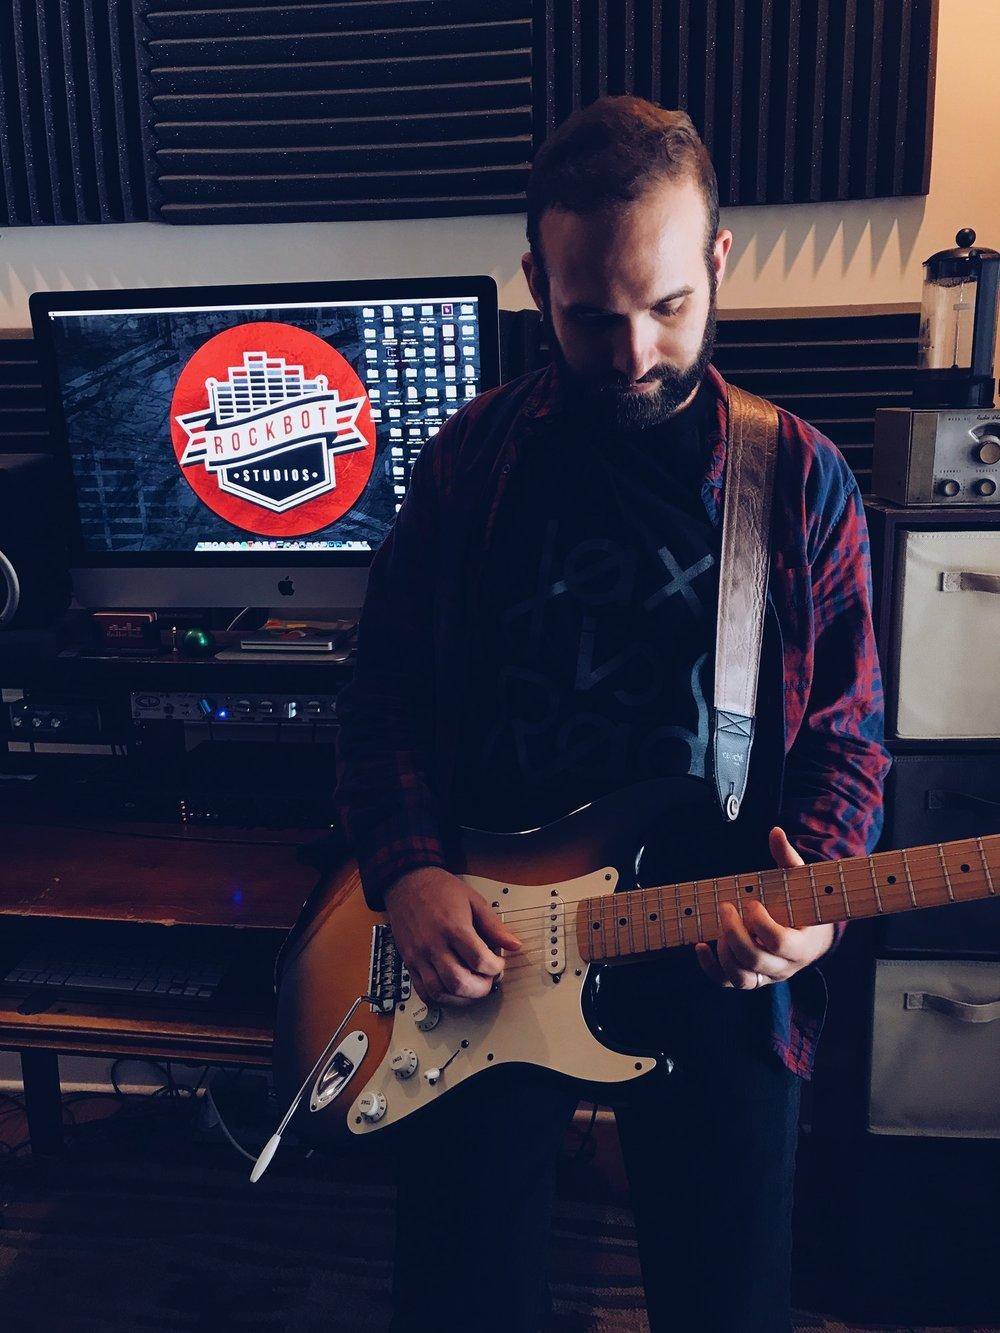 Josh Cobb -Audio Engineer, Musician